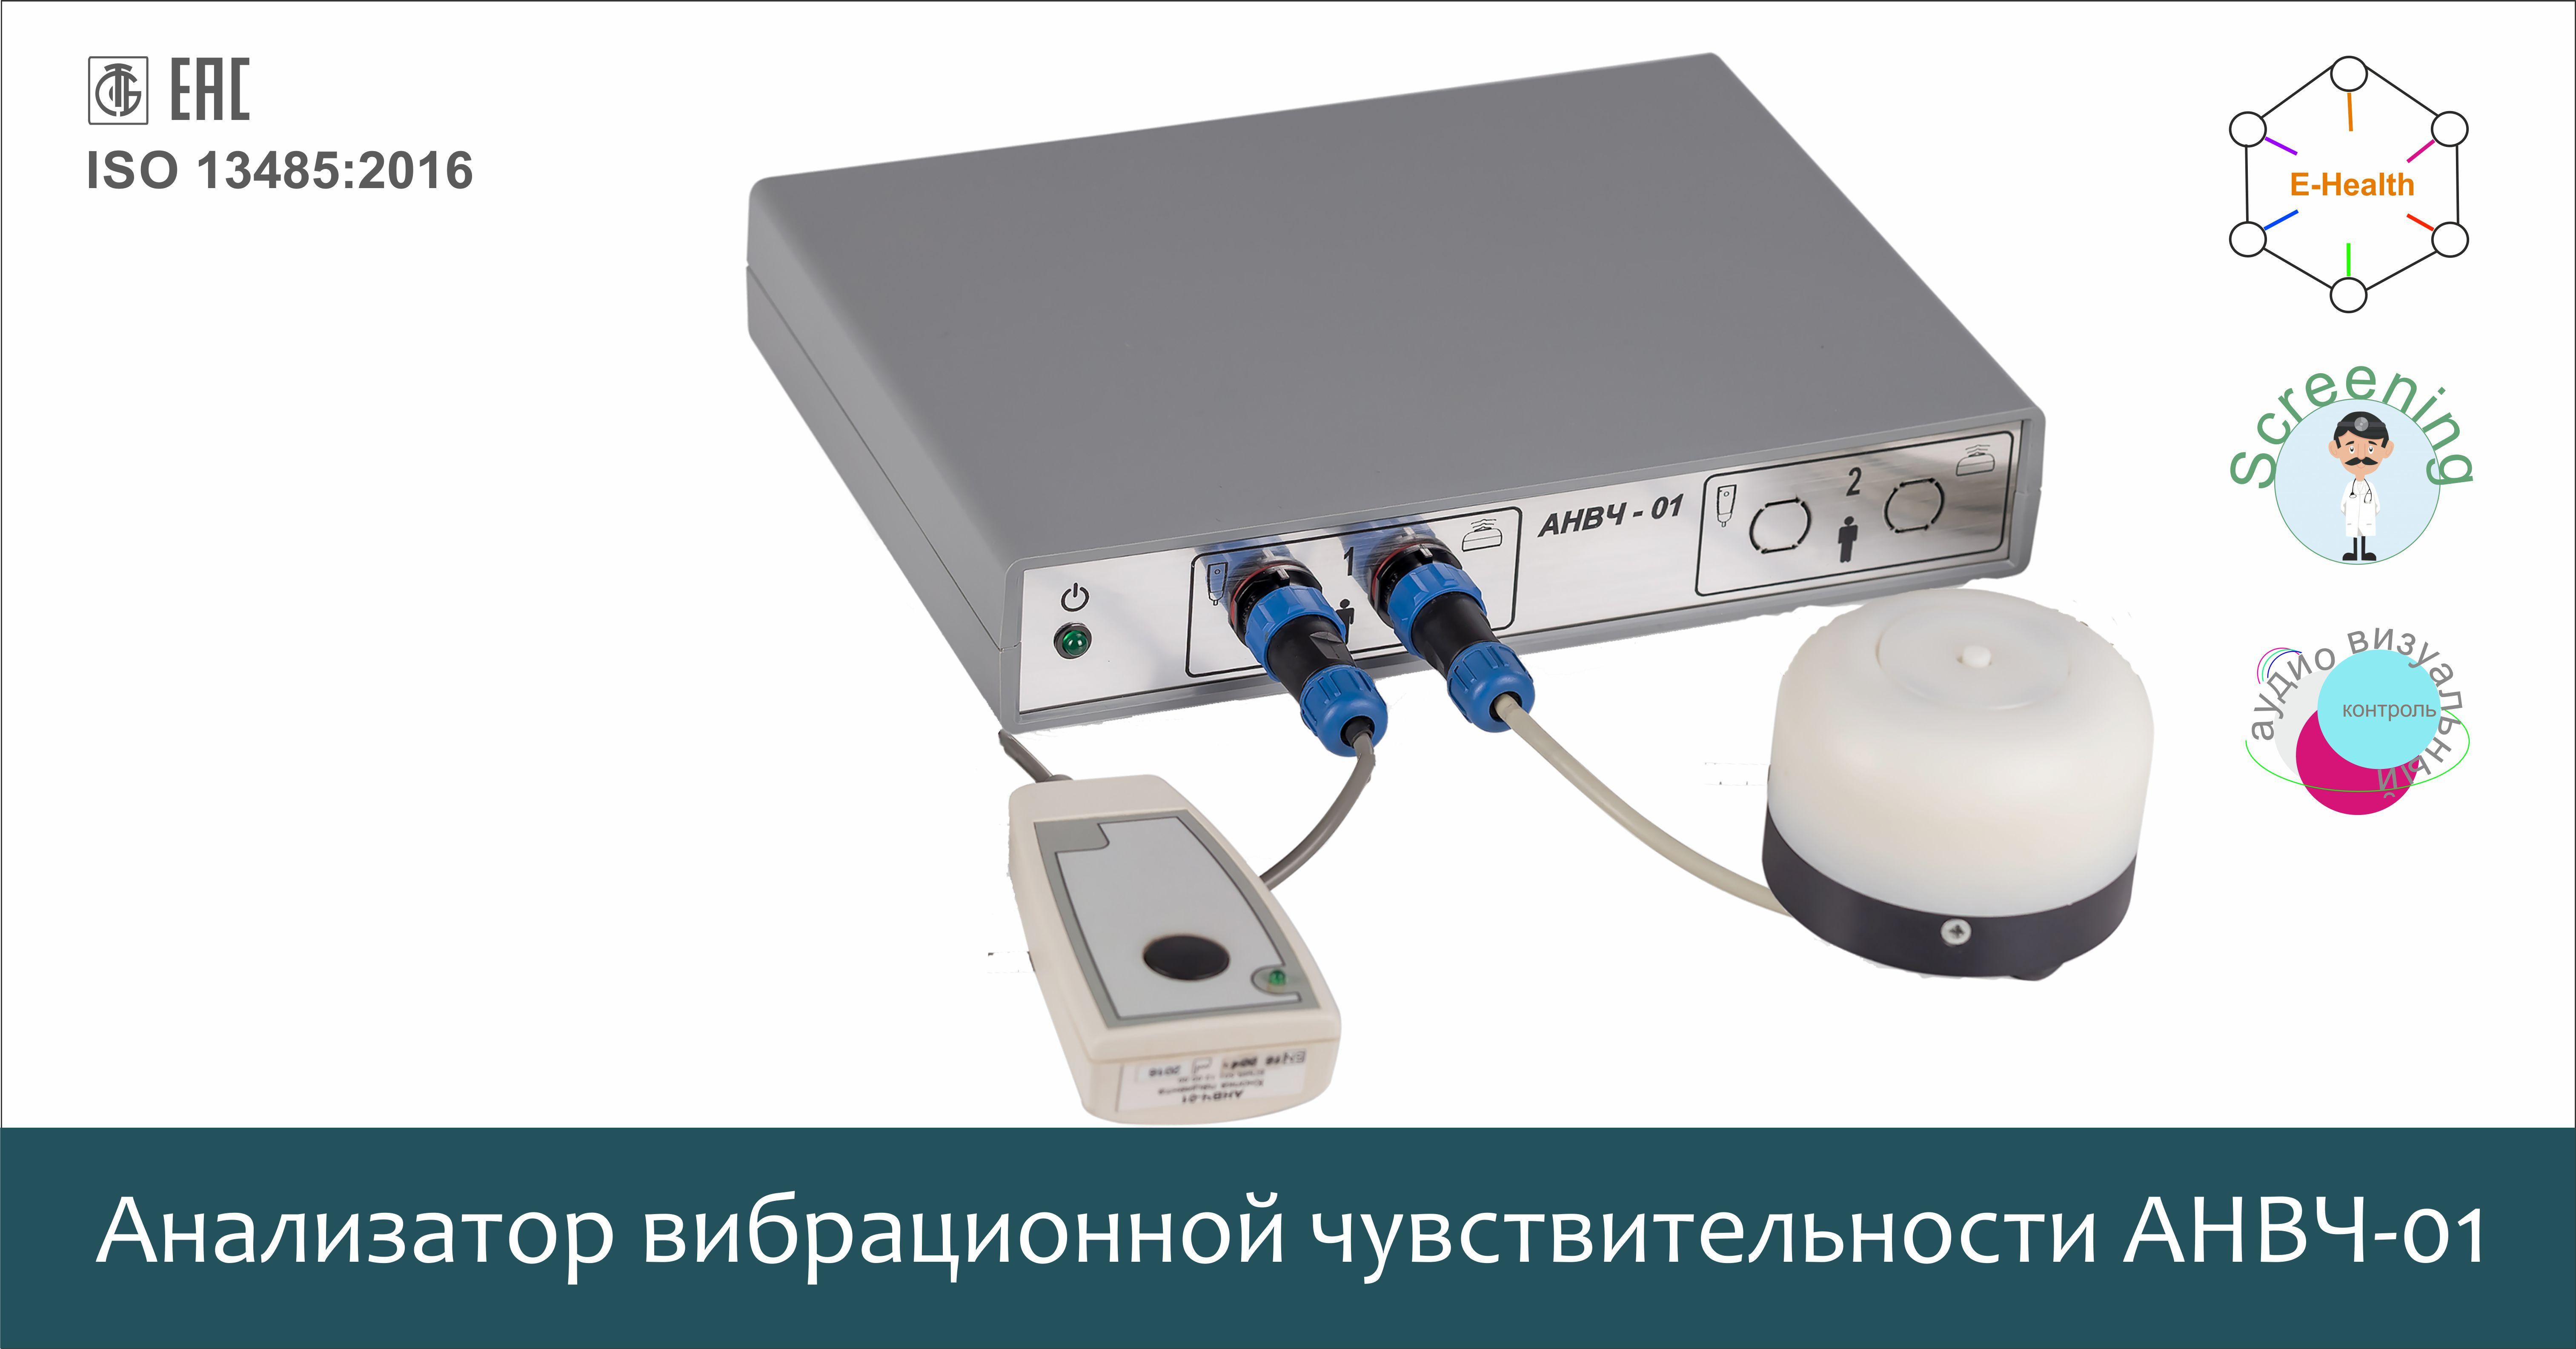 Паллестезиометр - вибротестер